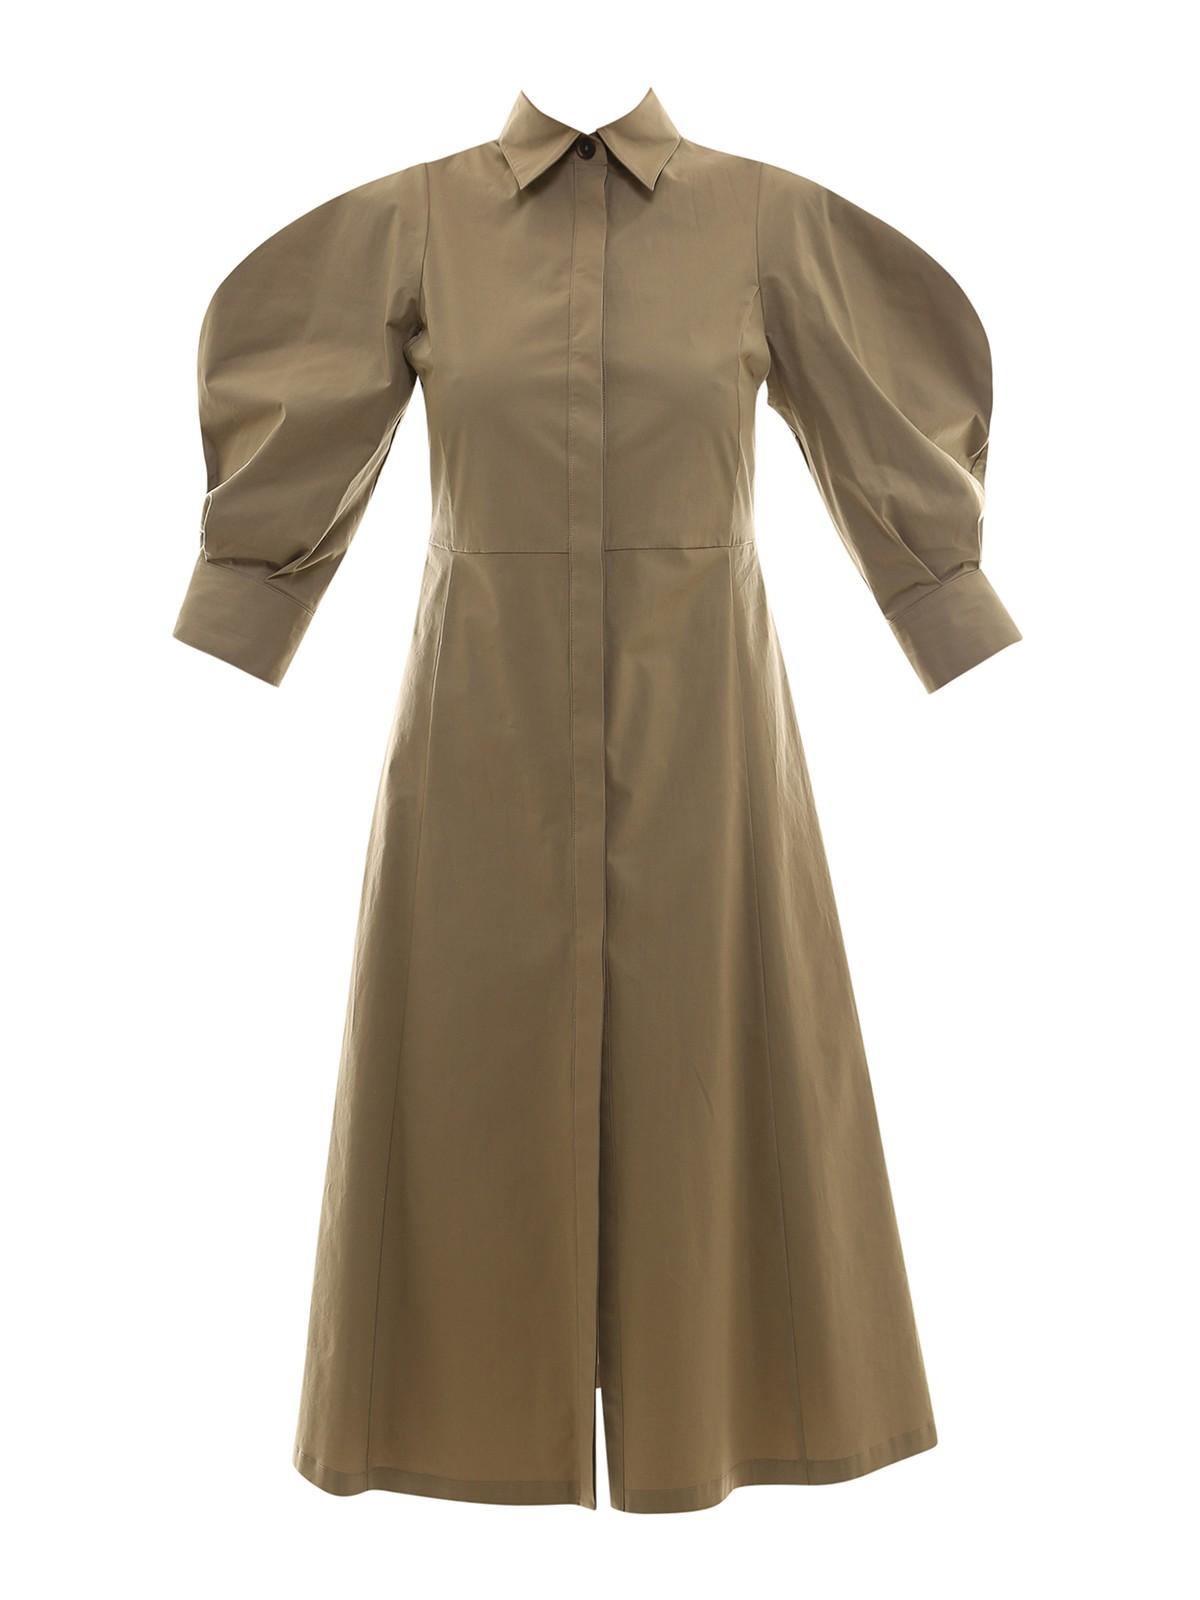 Erika Cavallini COTTON SHIRT DRESS